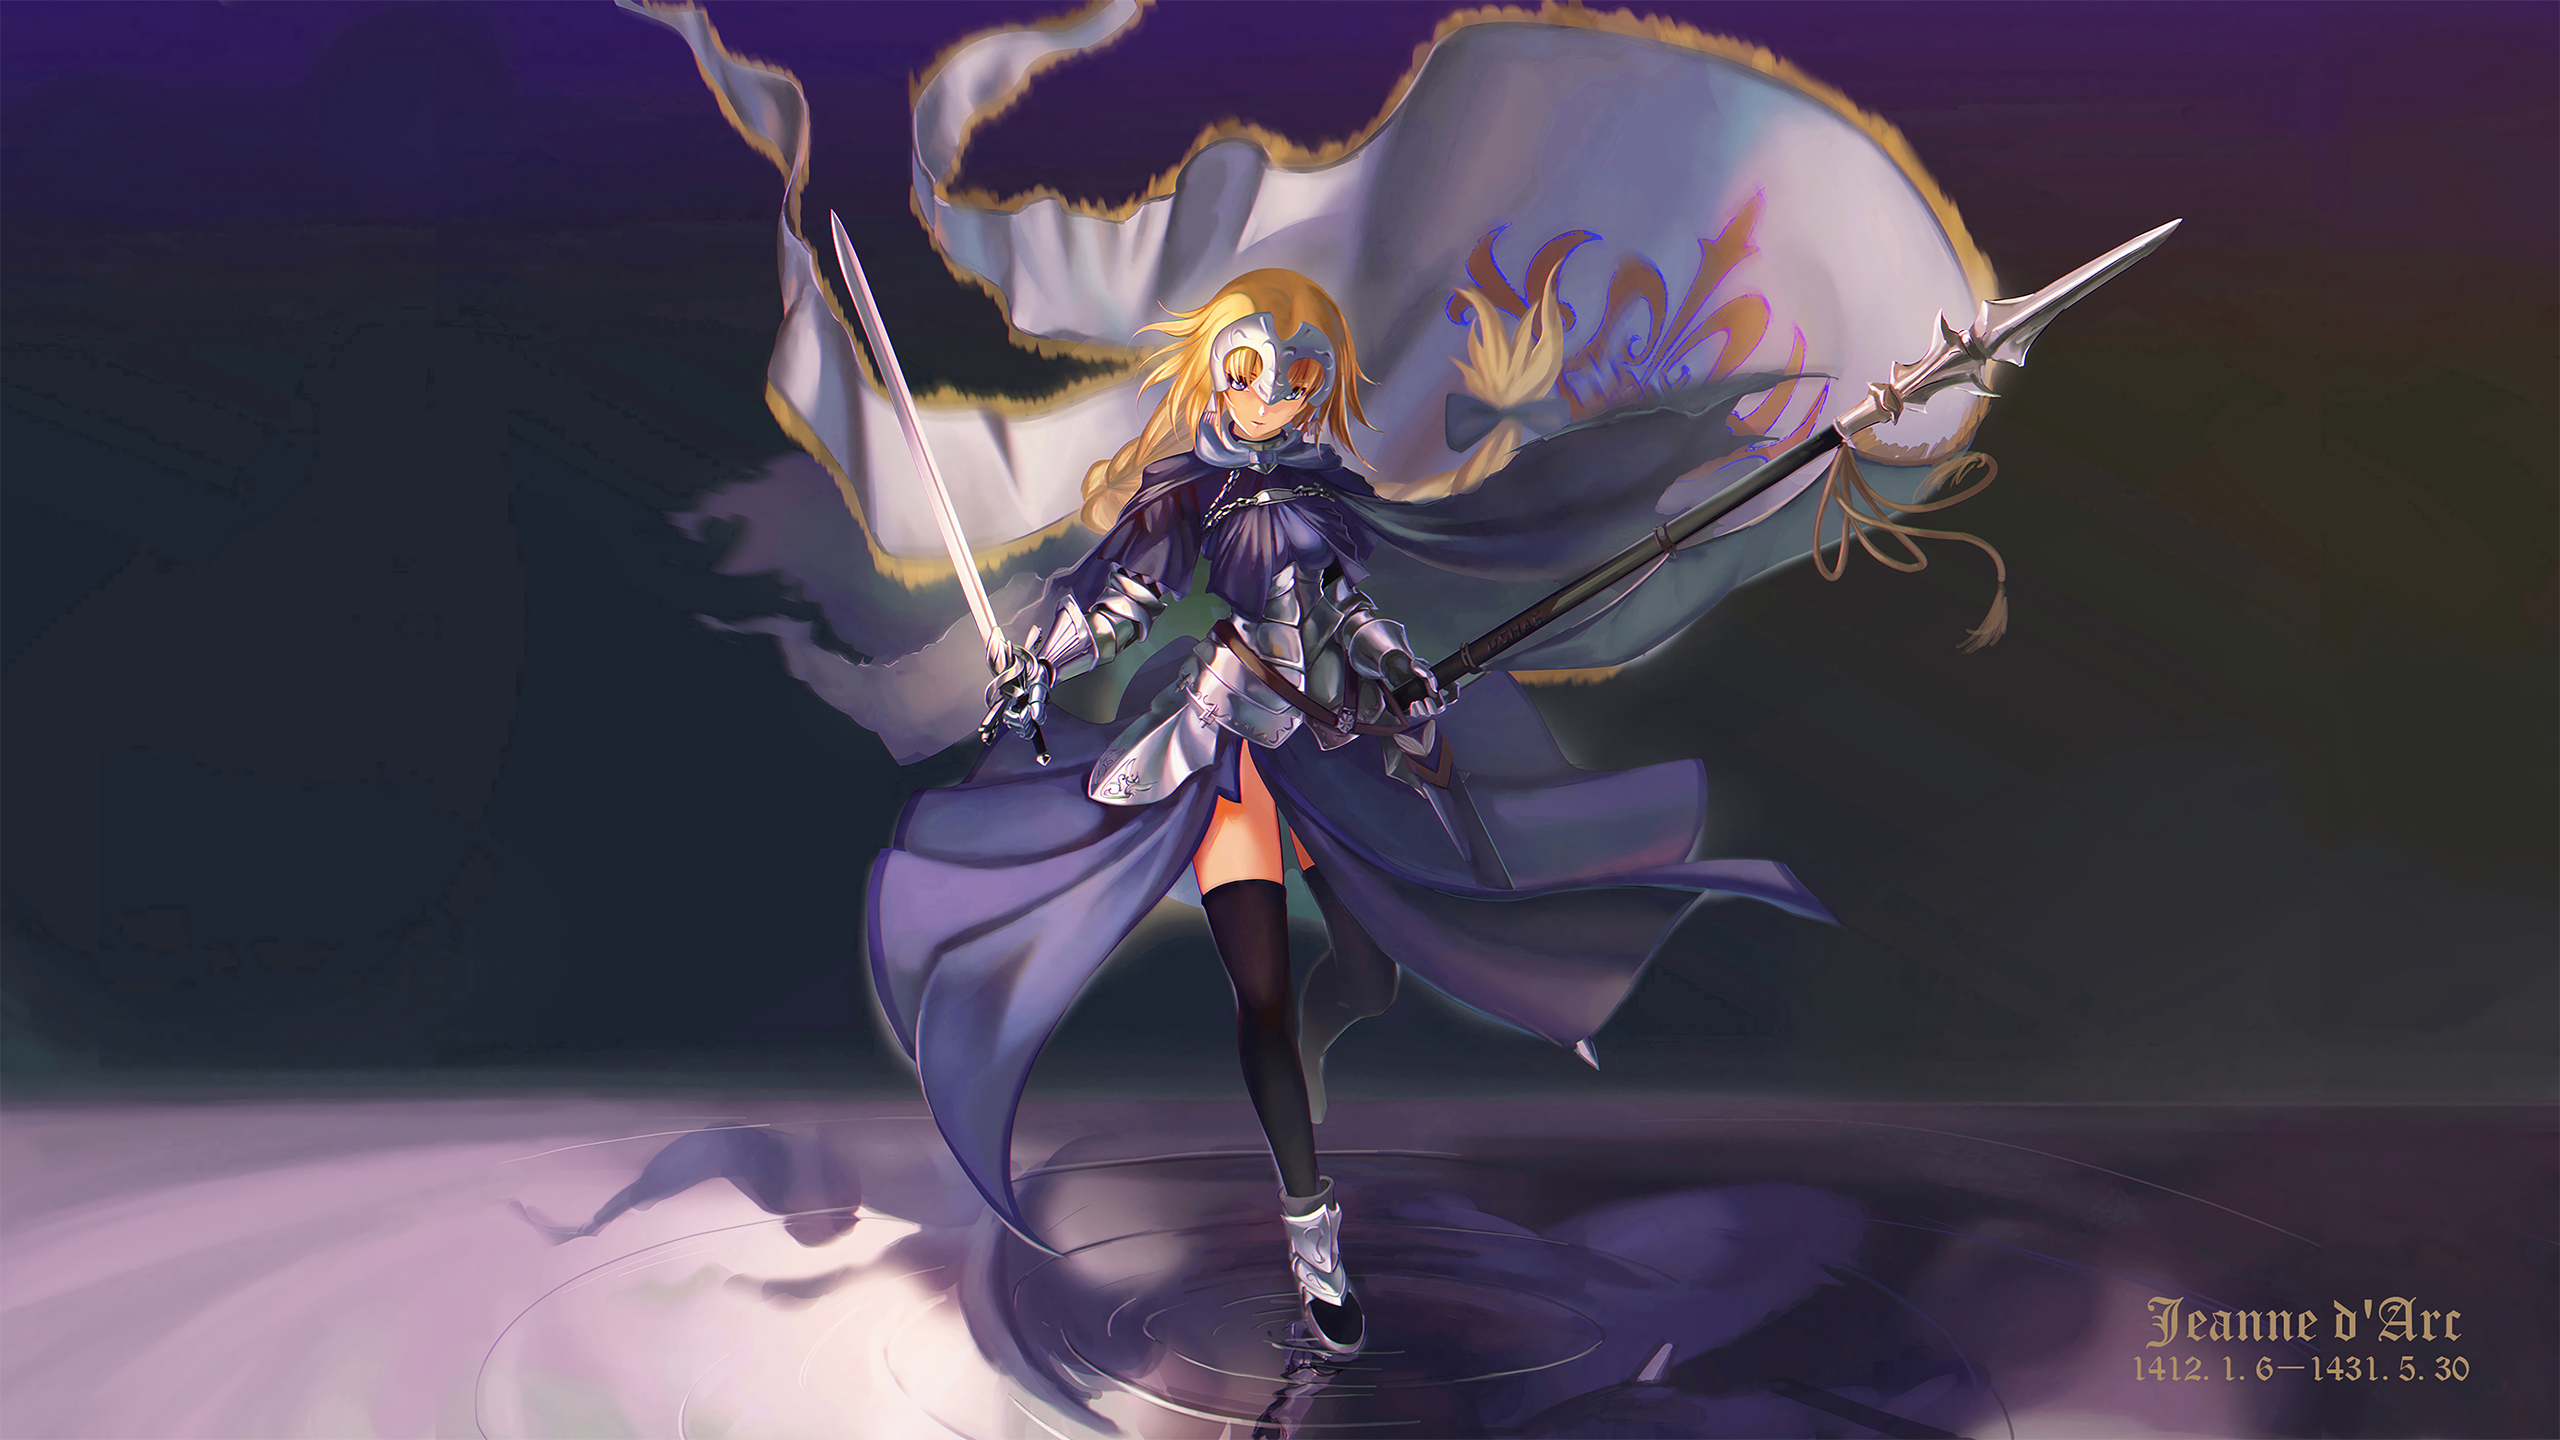 Anime Fate/Grand Order Jeanne D'Arc Wallpaper